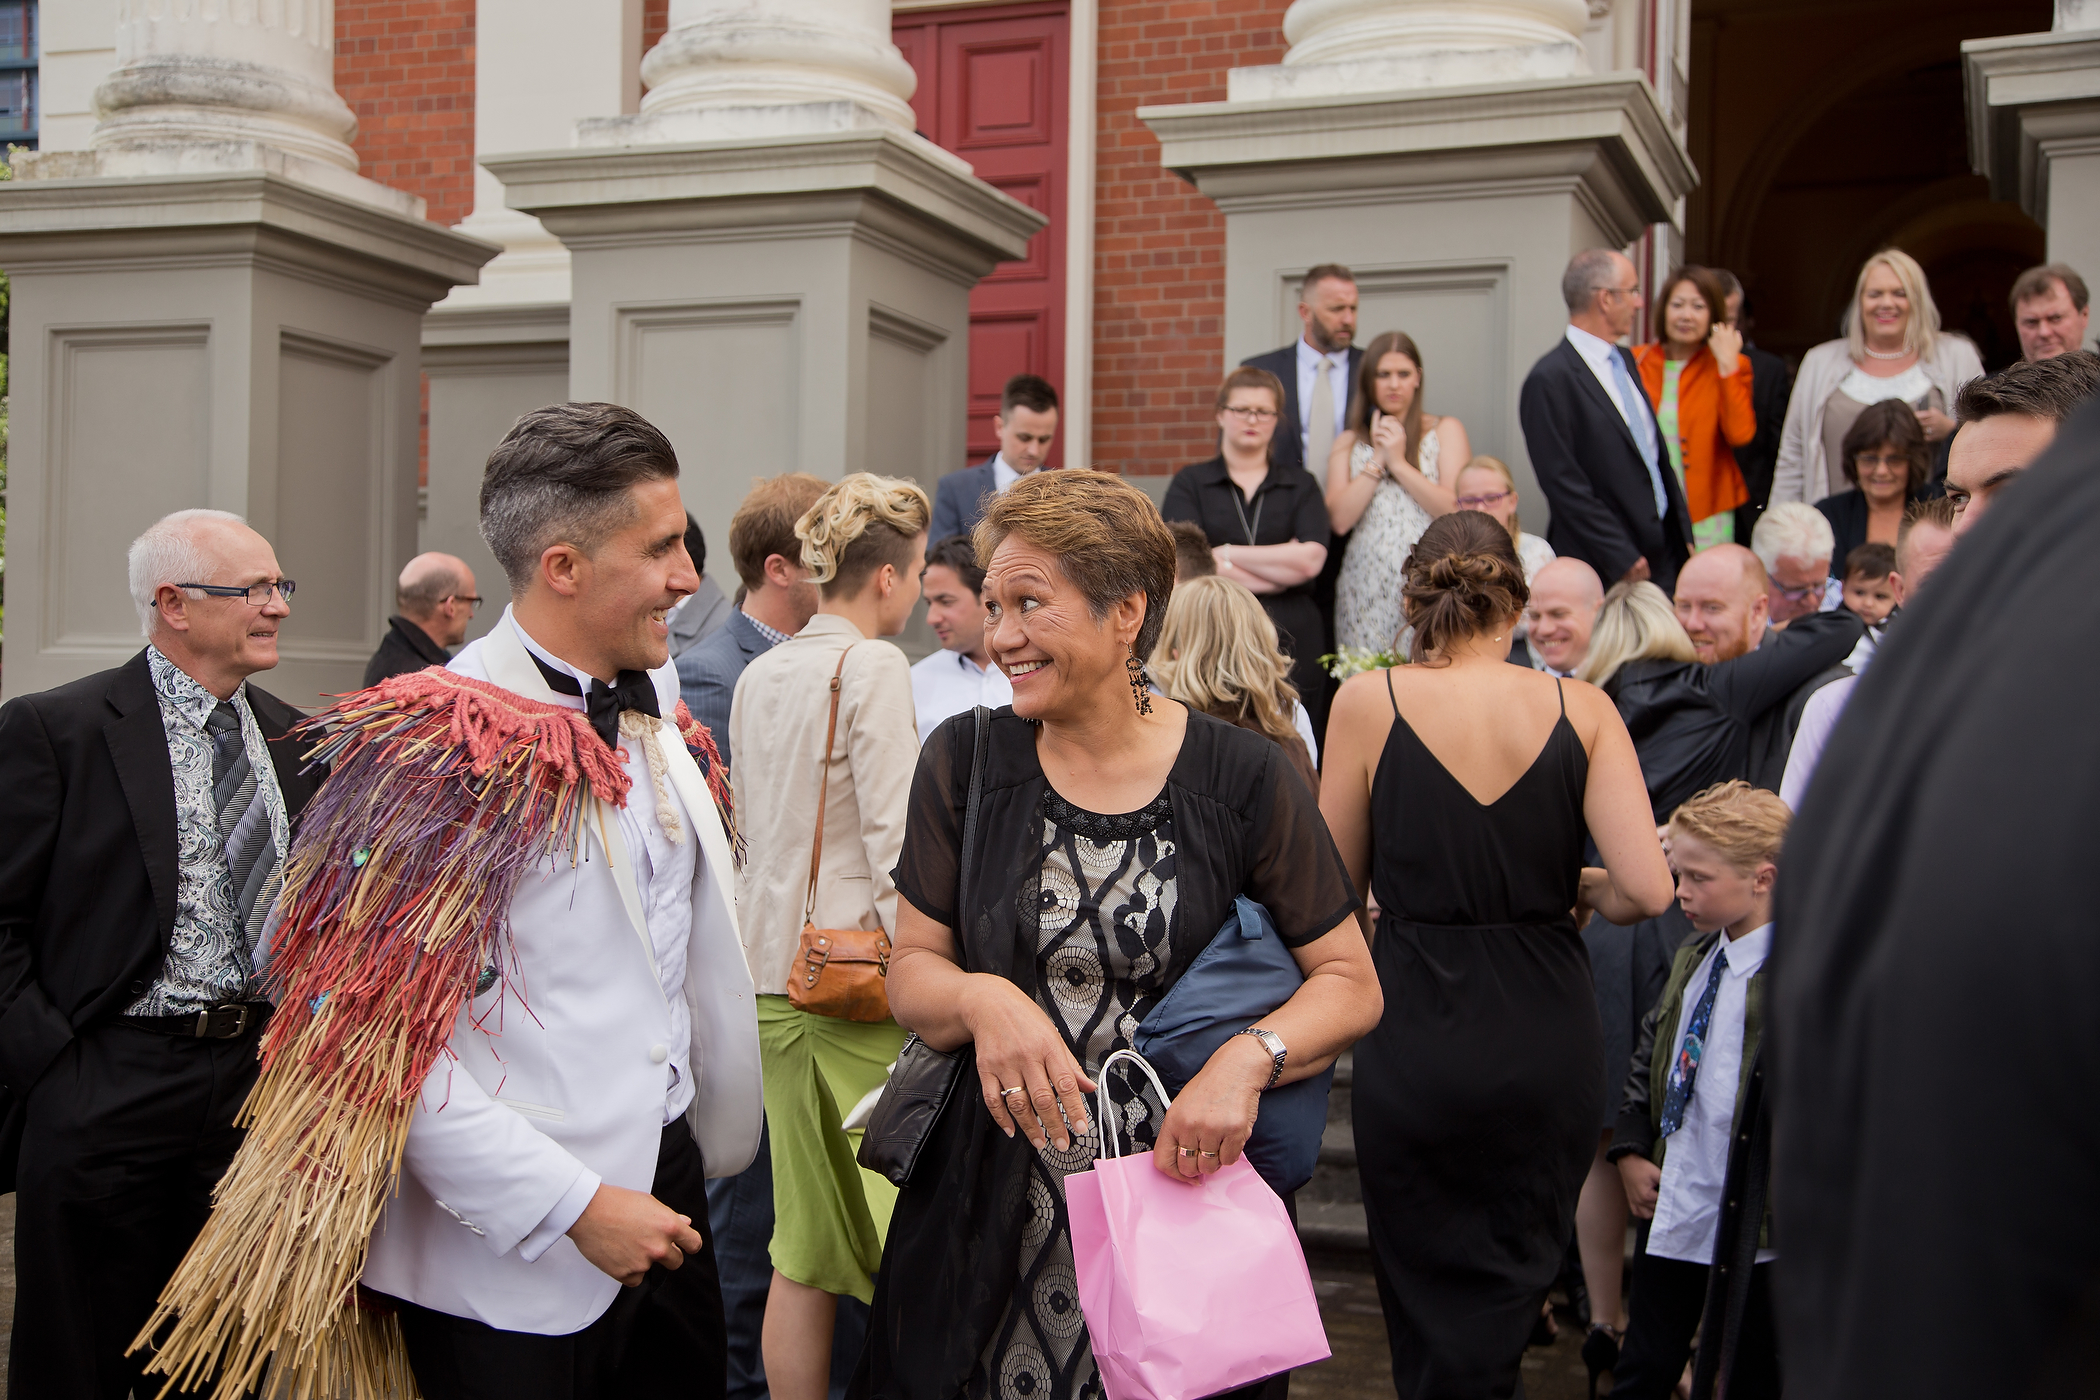 wellington wedding photography NZ - 1235.JPG